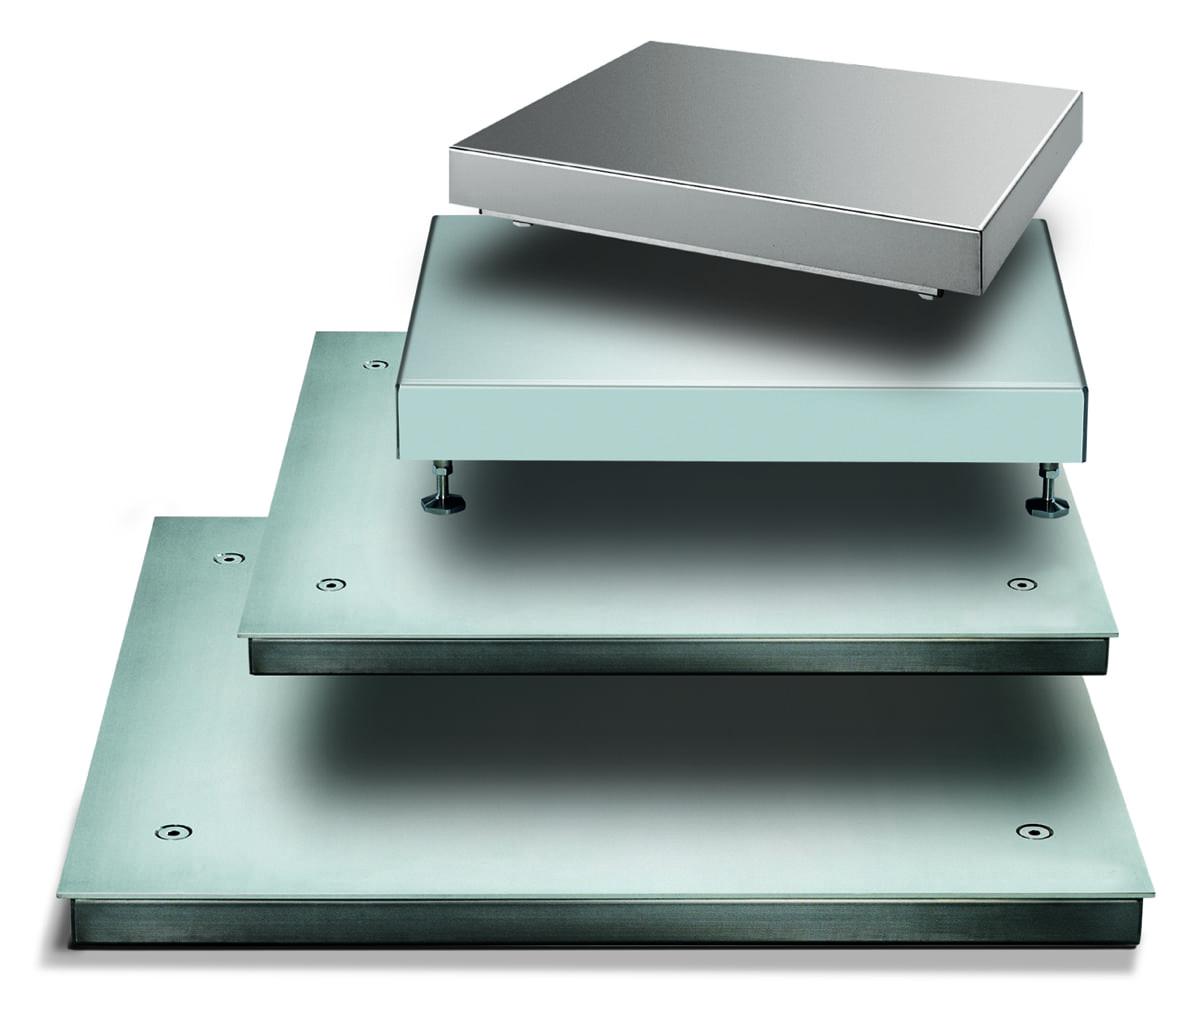 Minebea Intec Combics Weighing Platforms